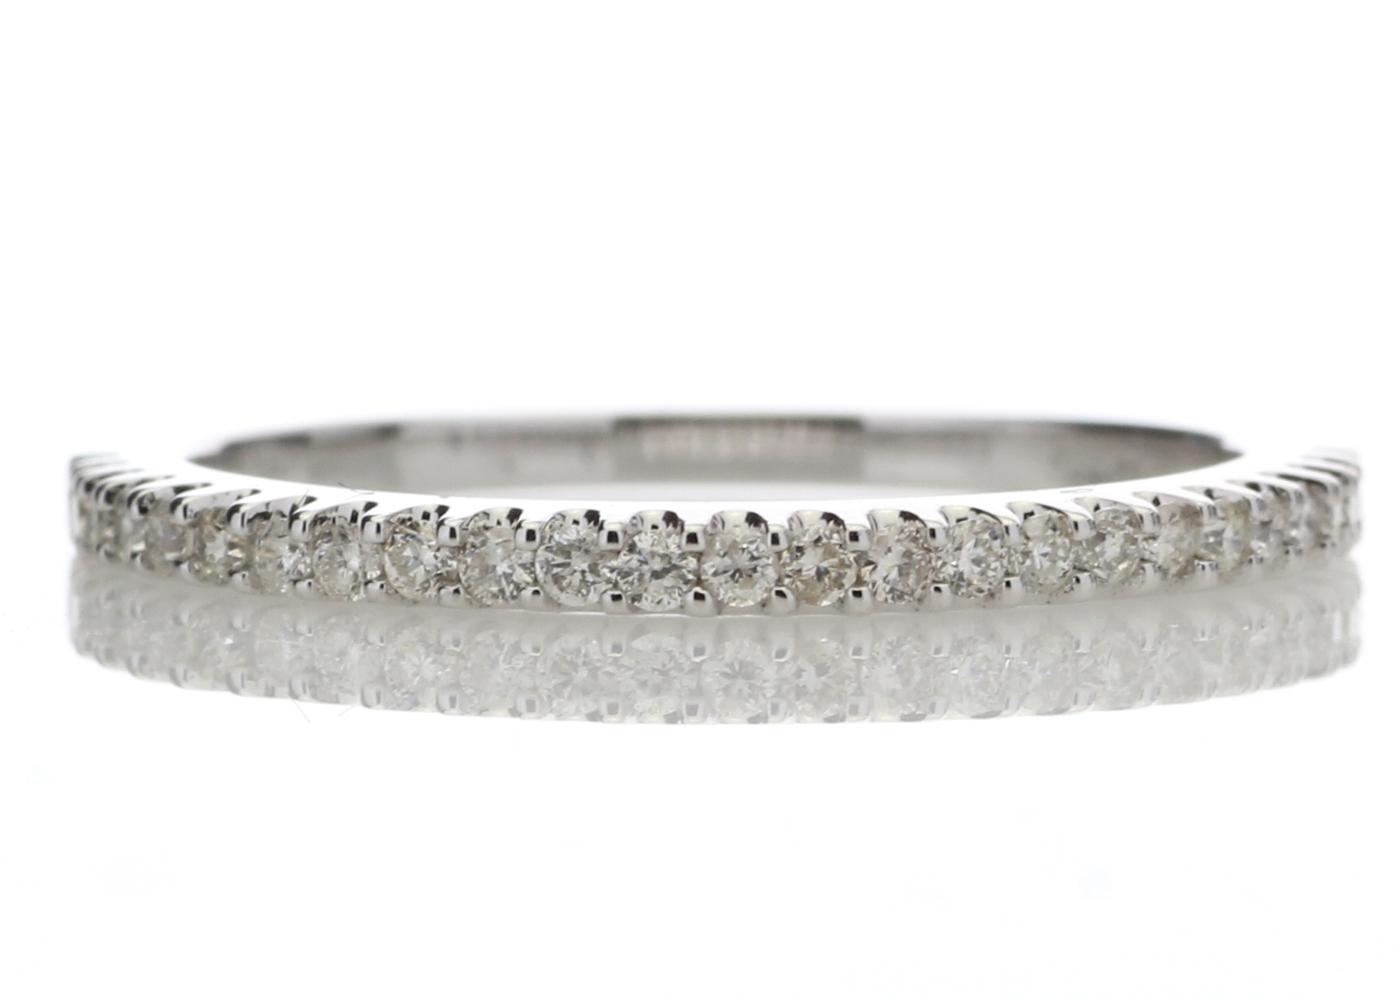 Lot 58 - 9ct White Gold Diamond Half Eternity Ring 0.25 Carats